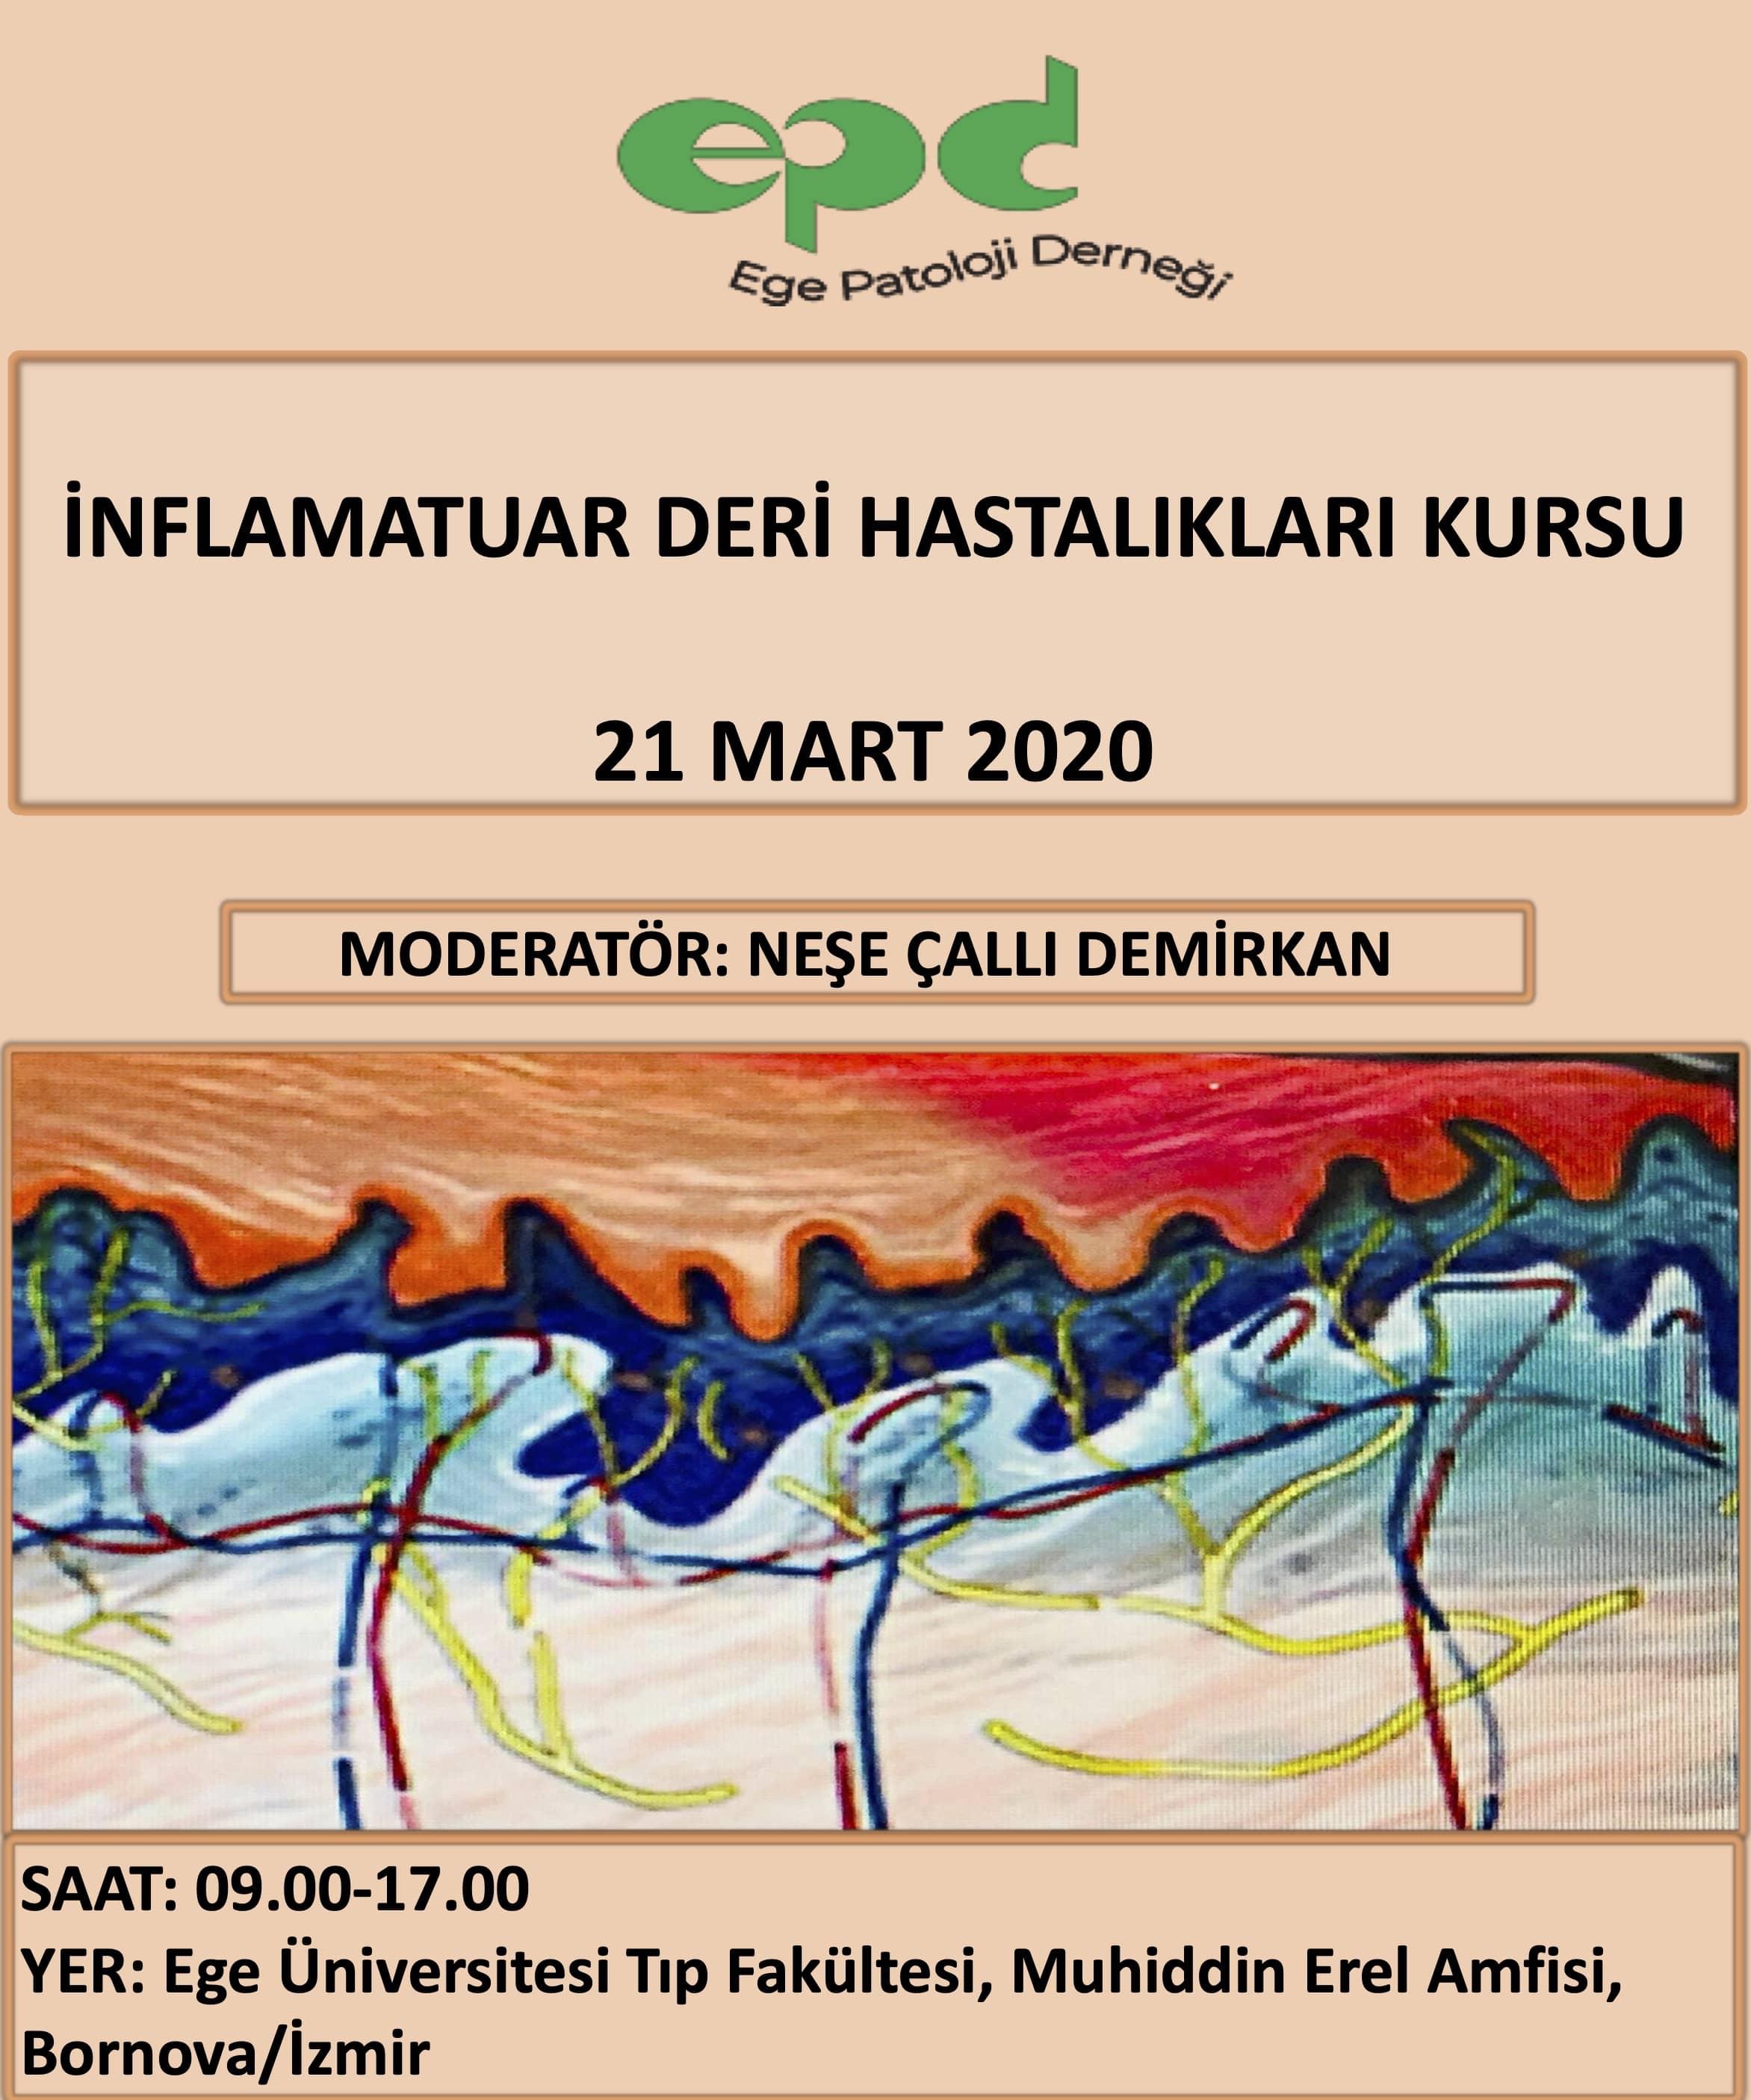 21 MART 2020 - İNFLAMATUAR DERİ HASTALIKLARI KURSU